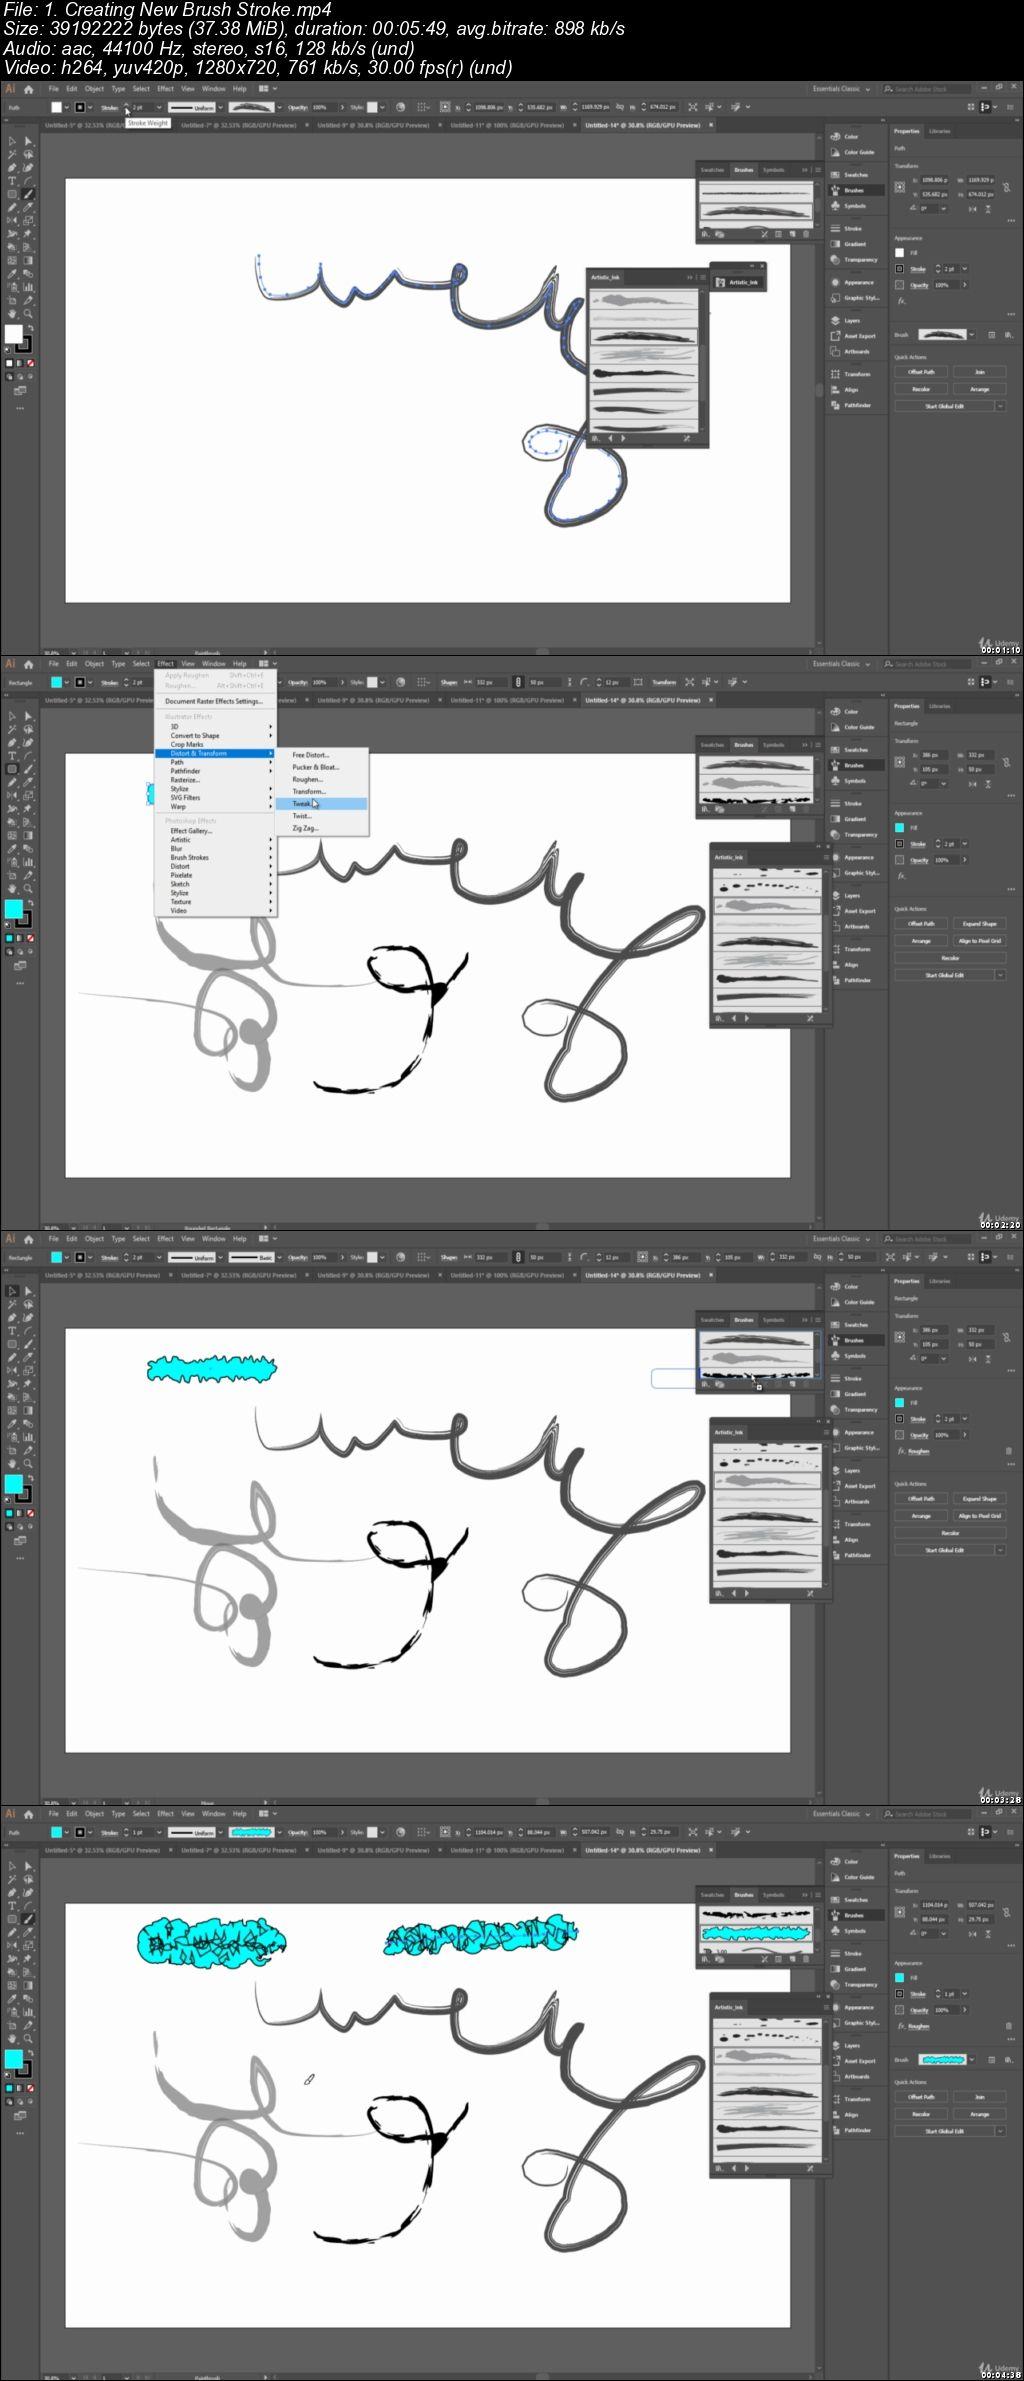 Adobe Illustrator CC - Basic Fundamentals For Beginners